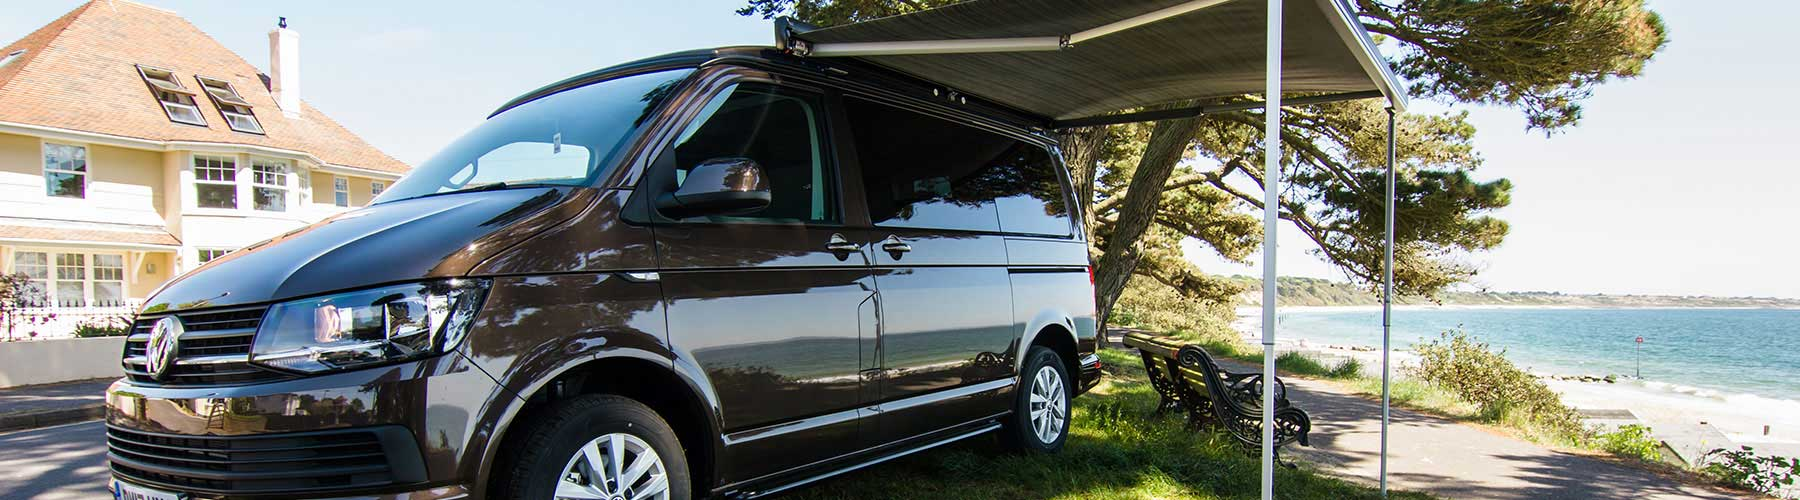 Revampavan Camper Conversions - Revamp Your Lifestyle